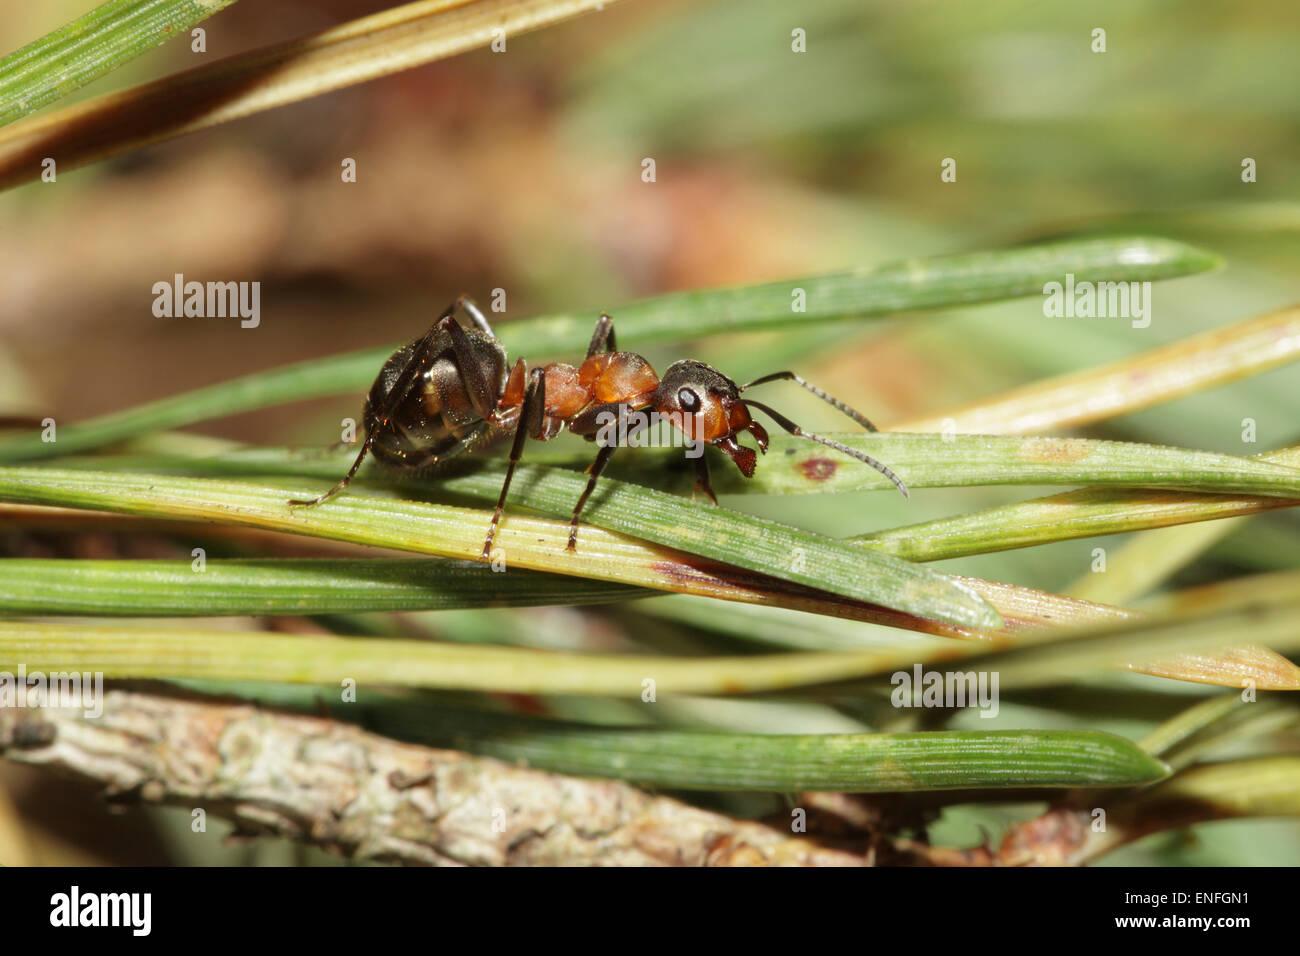 Wood ant - Formica rufa - Stock Image